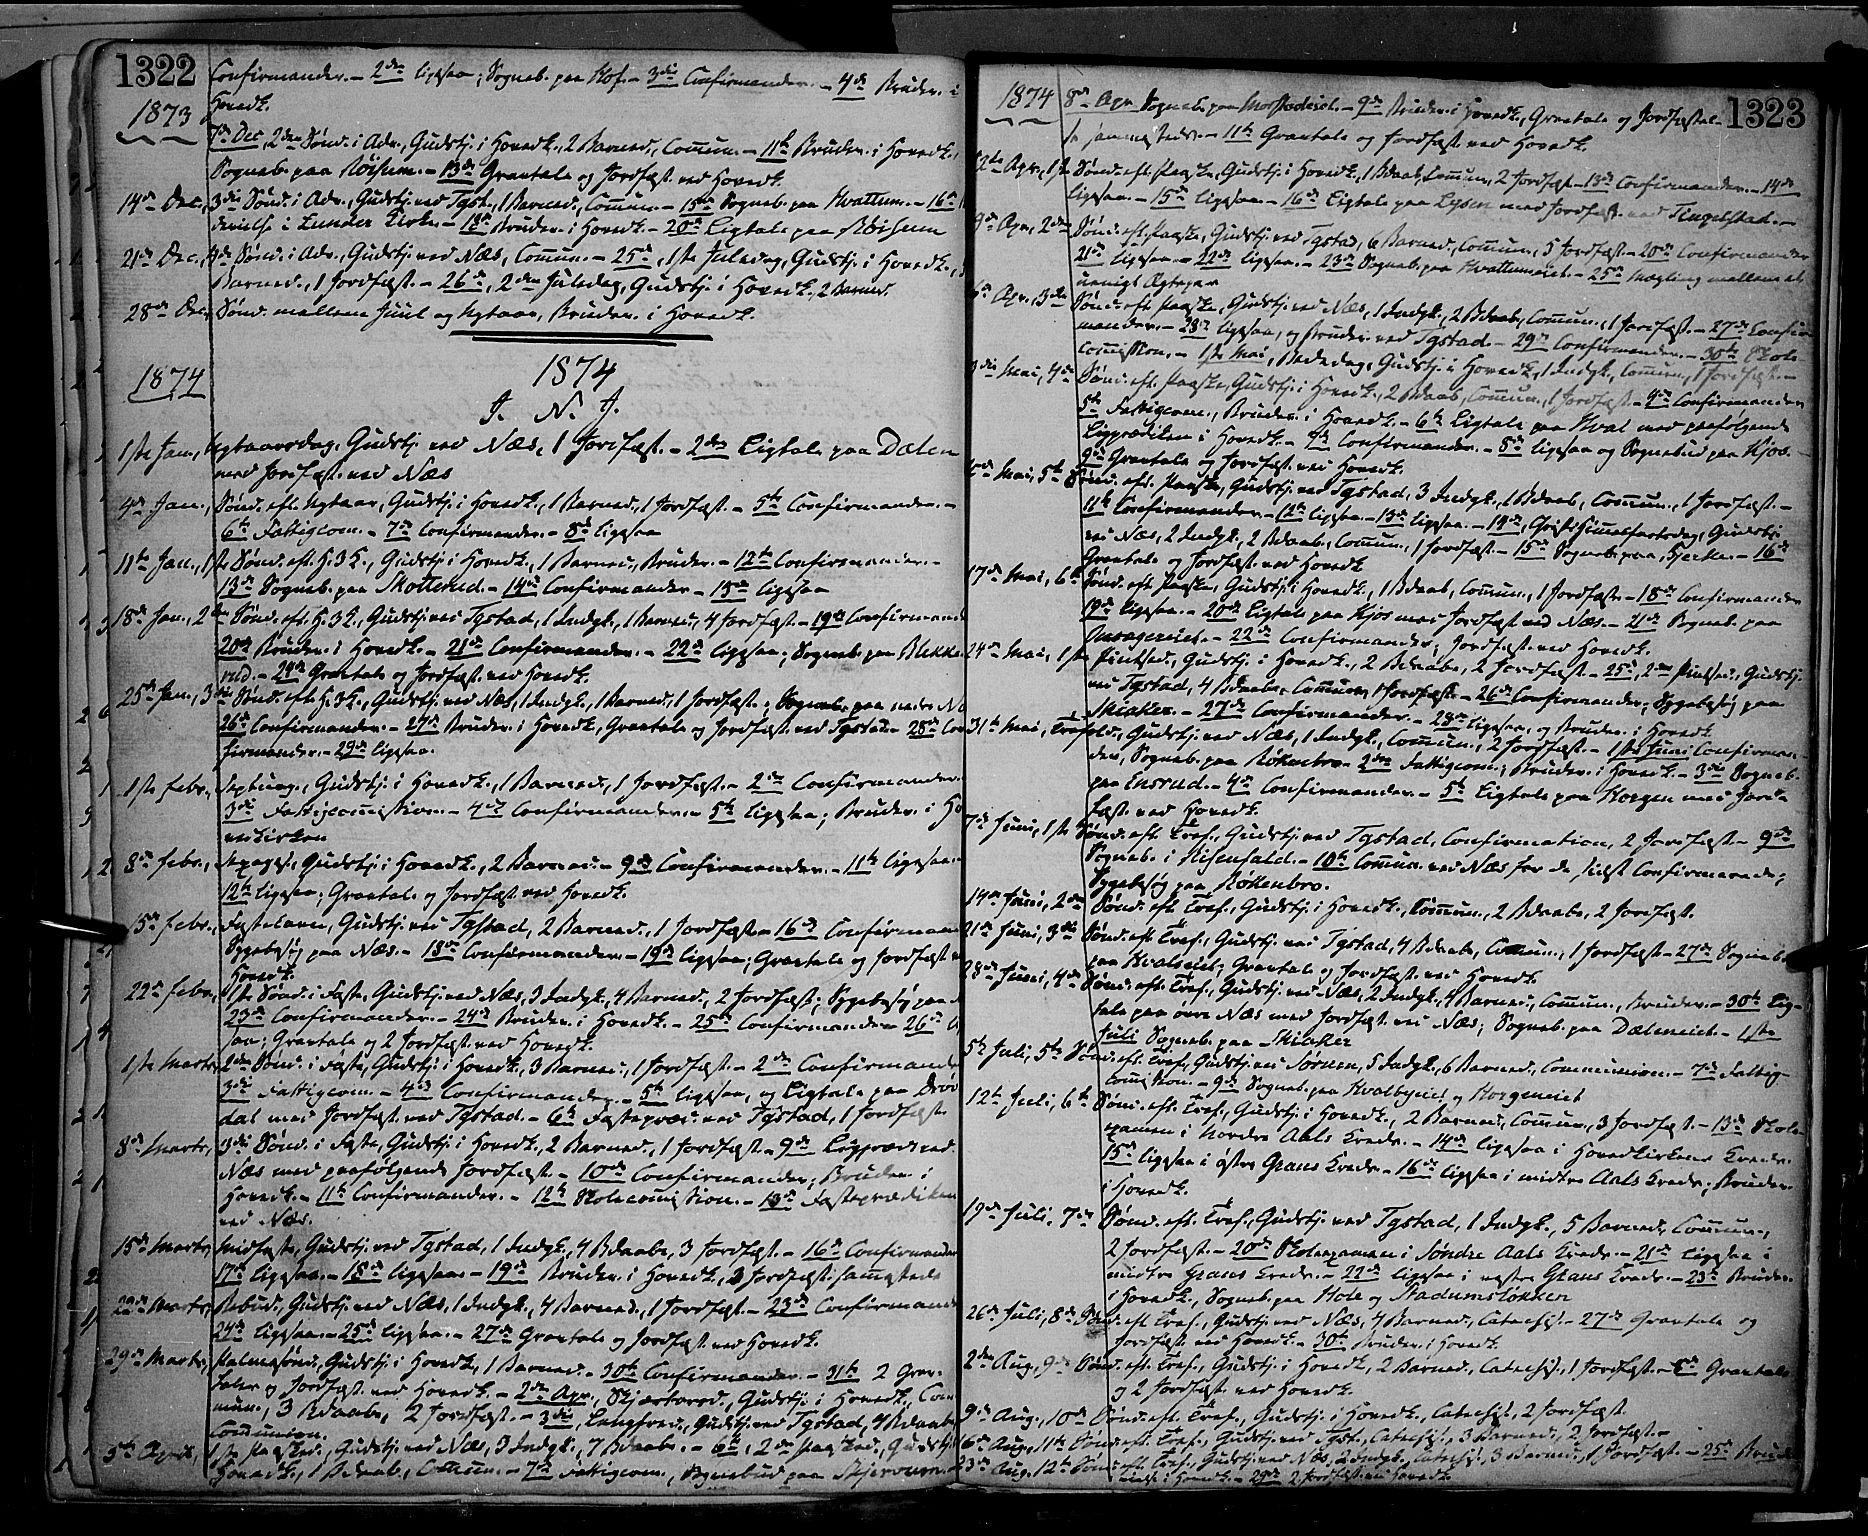 SAH, Gran prestekontor, Ministerialbok nr. 12, 1856-1874, s. 1322-1323